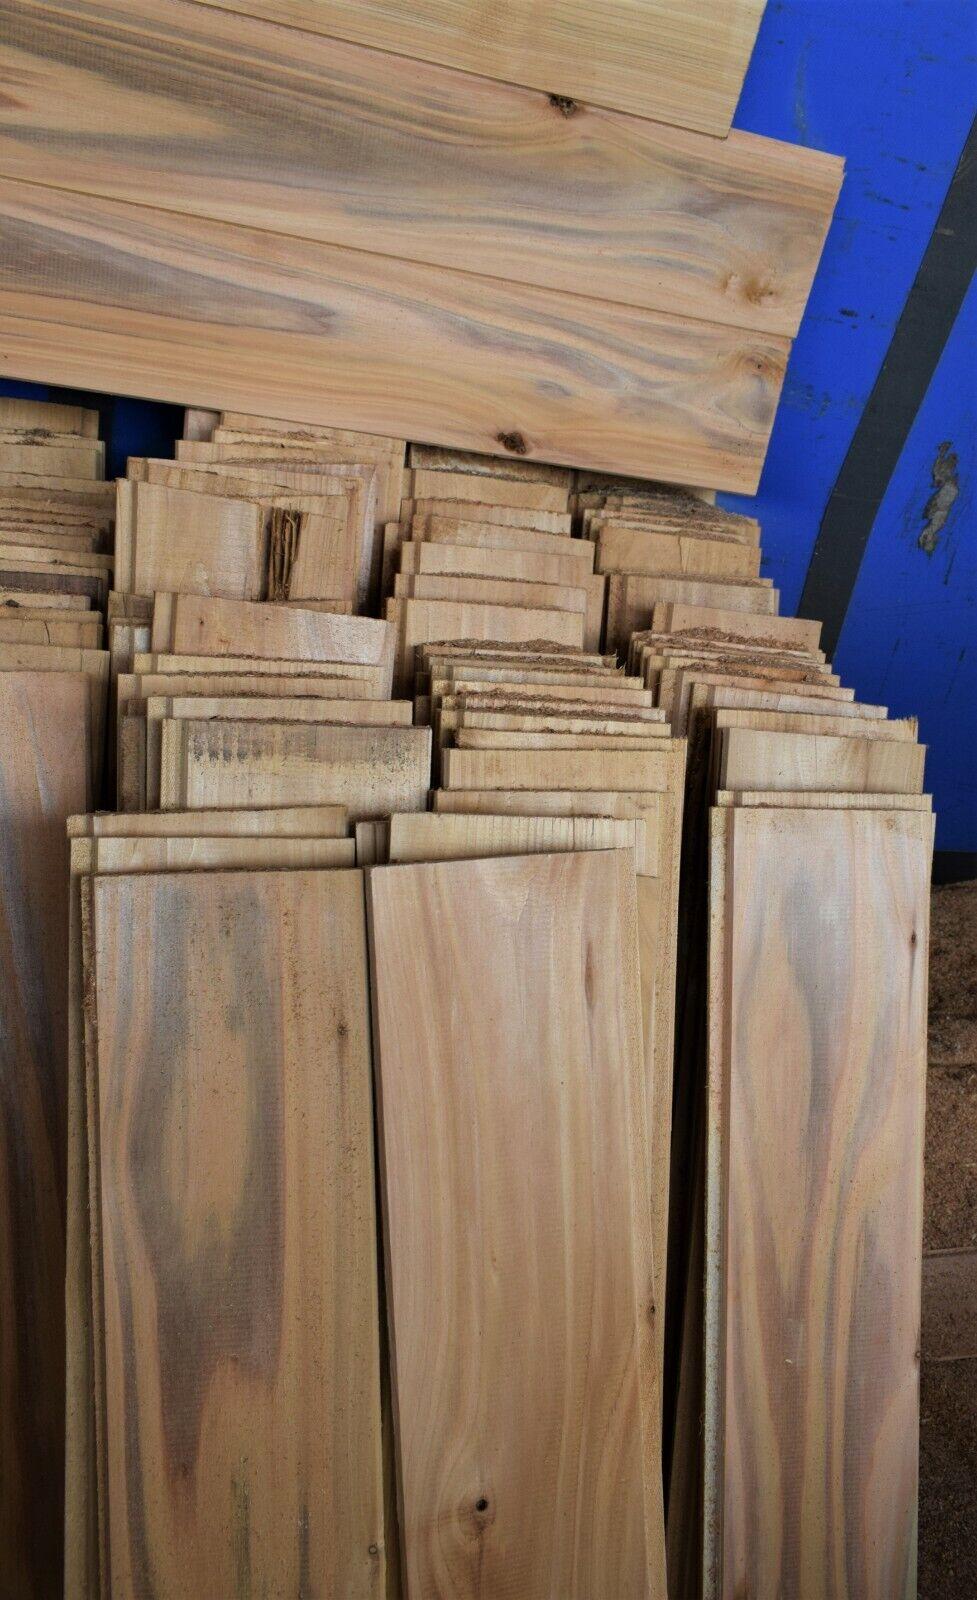 (1m²) Off Cuts 15 x 135 British Red Cedar Tongue Groove Timber Cladding